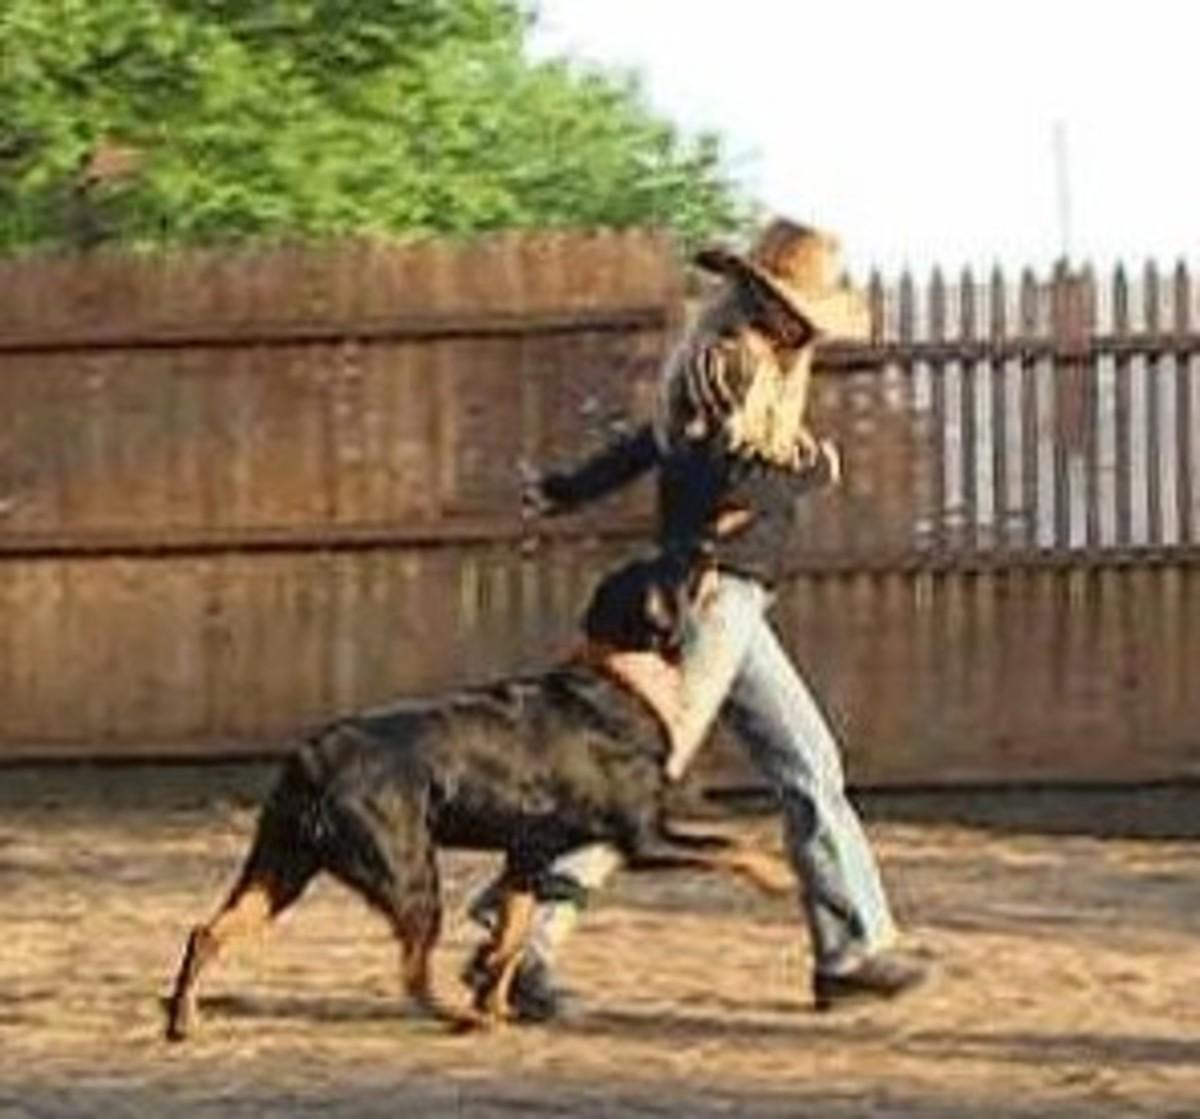 understanding-the-effects-of-aversive-dog-training